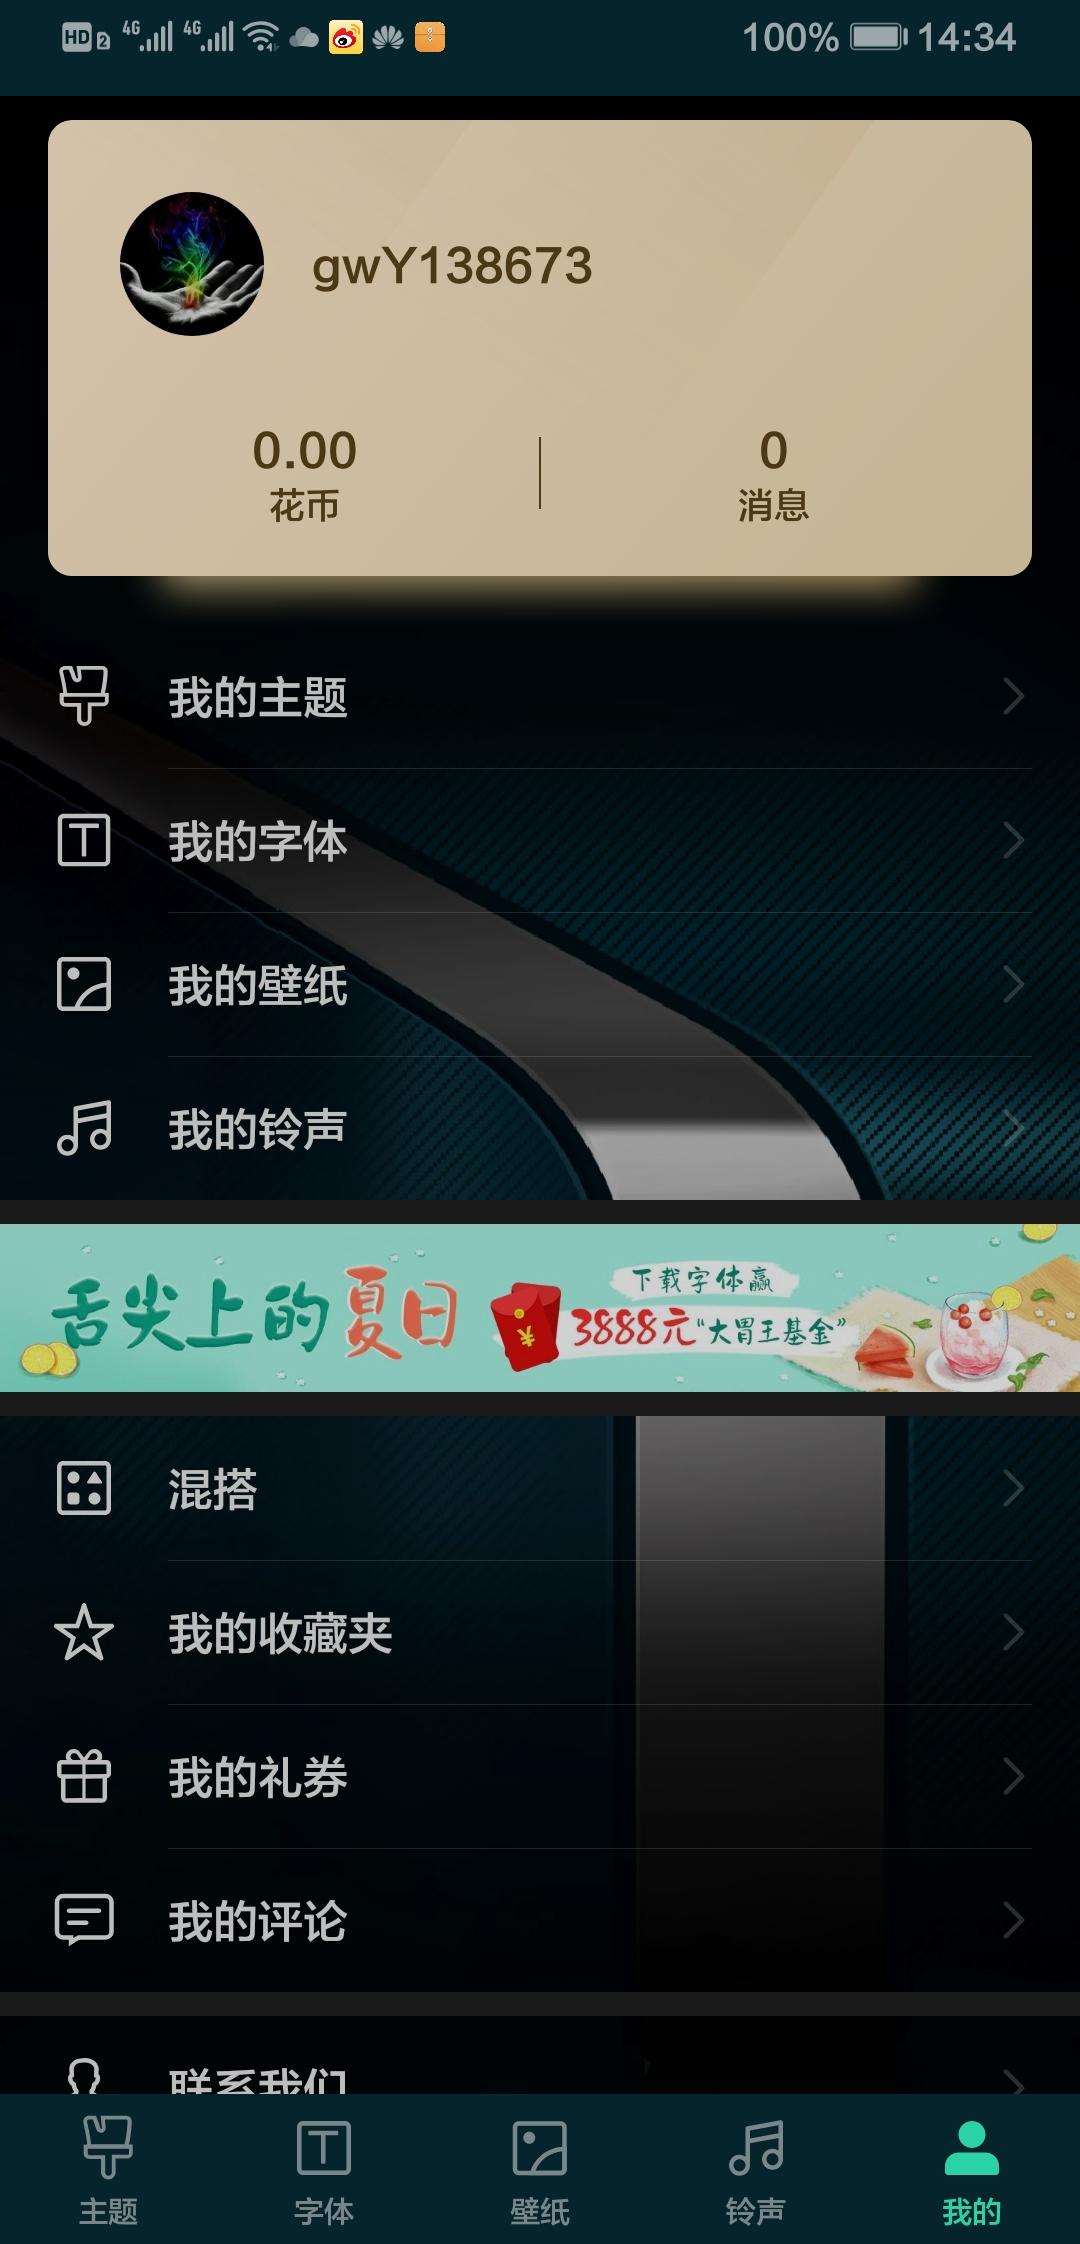 Screenshot_20190623_143437_com.huawei.android.thememanager.jpg